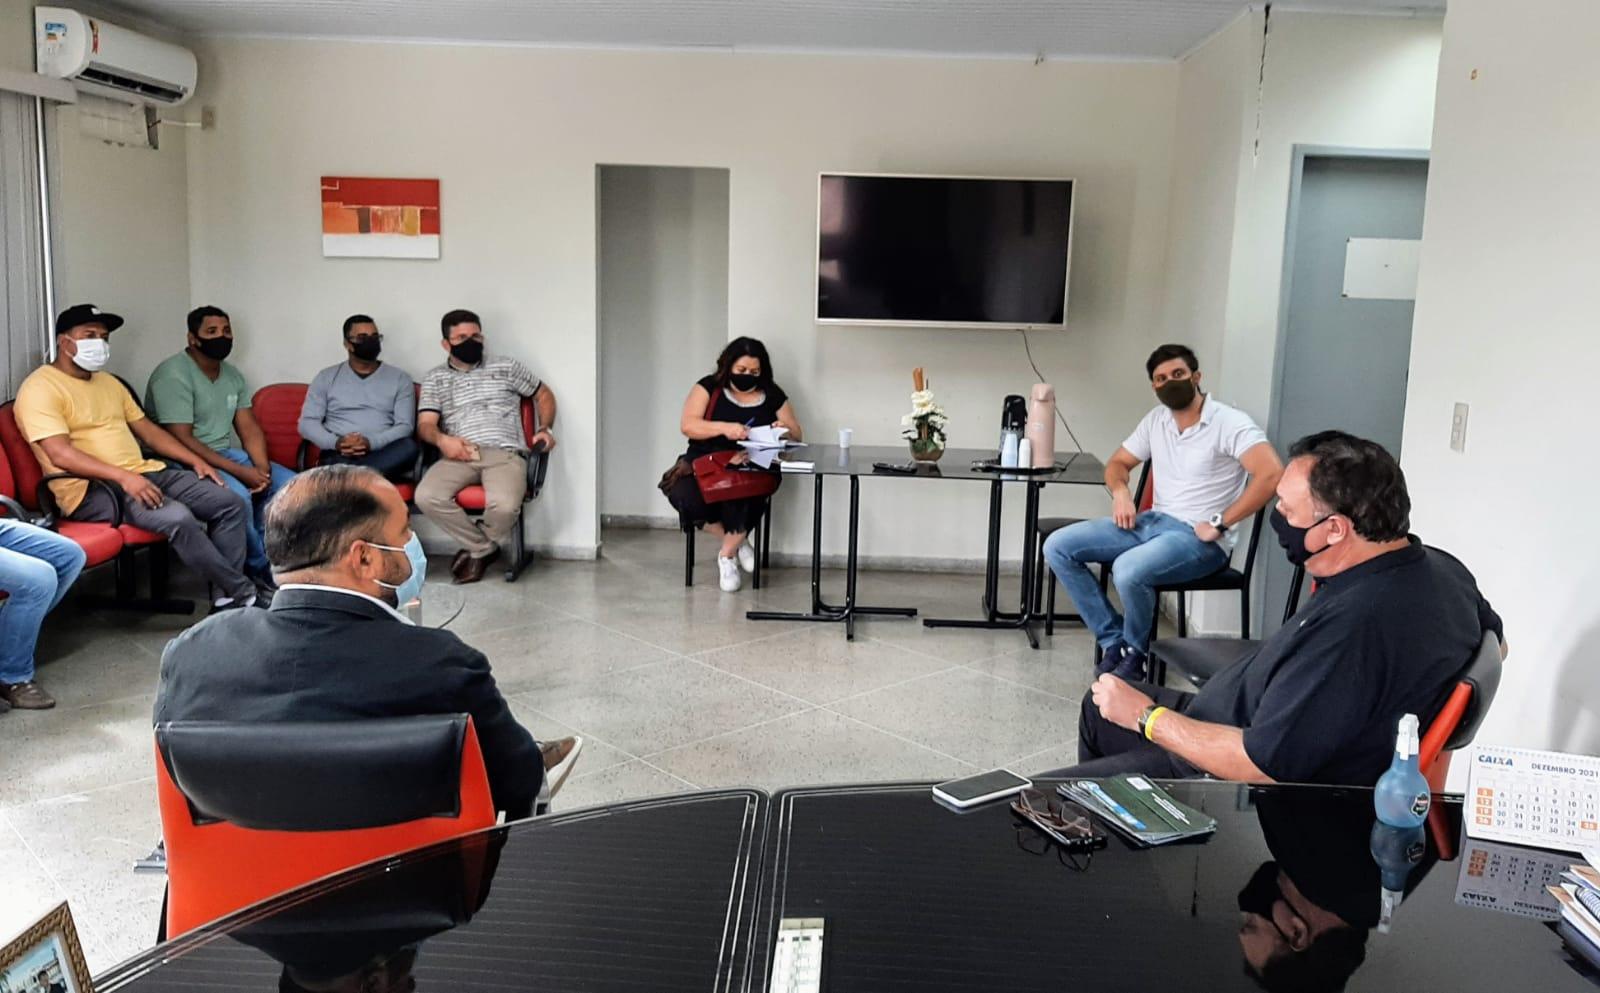 Câmara de Eunápolis recebe visita do presidente da União dos Vereadores do Brasil 24